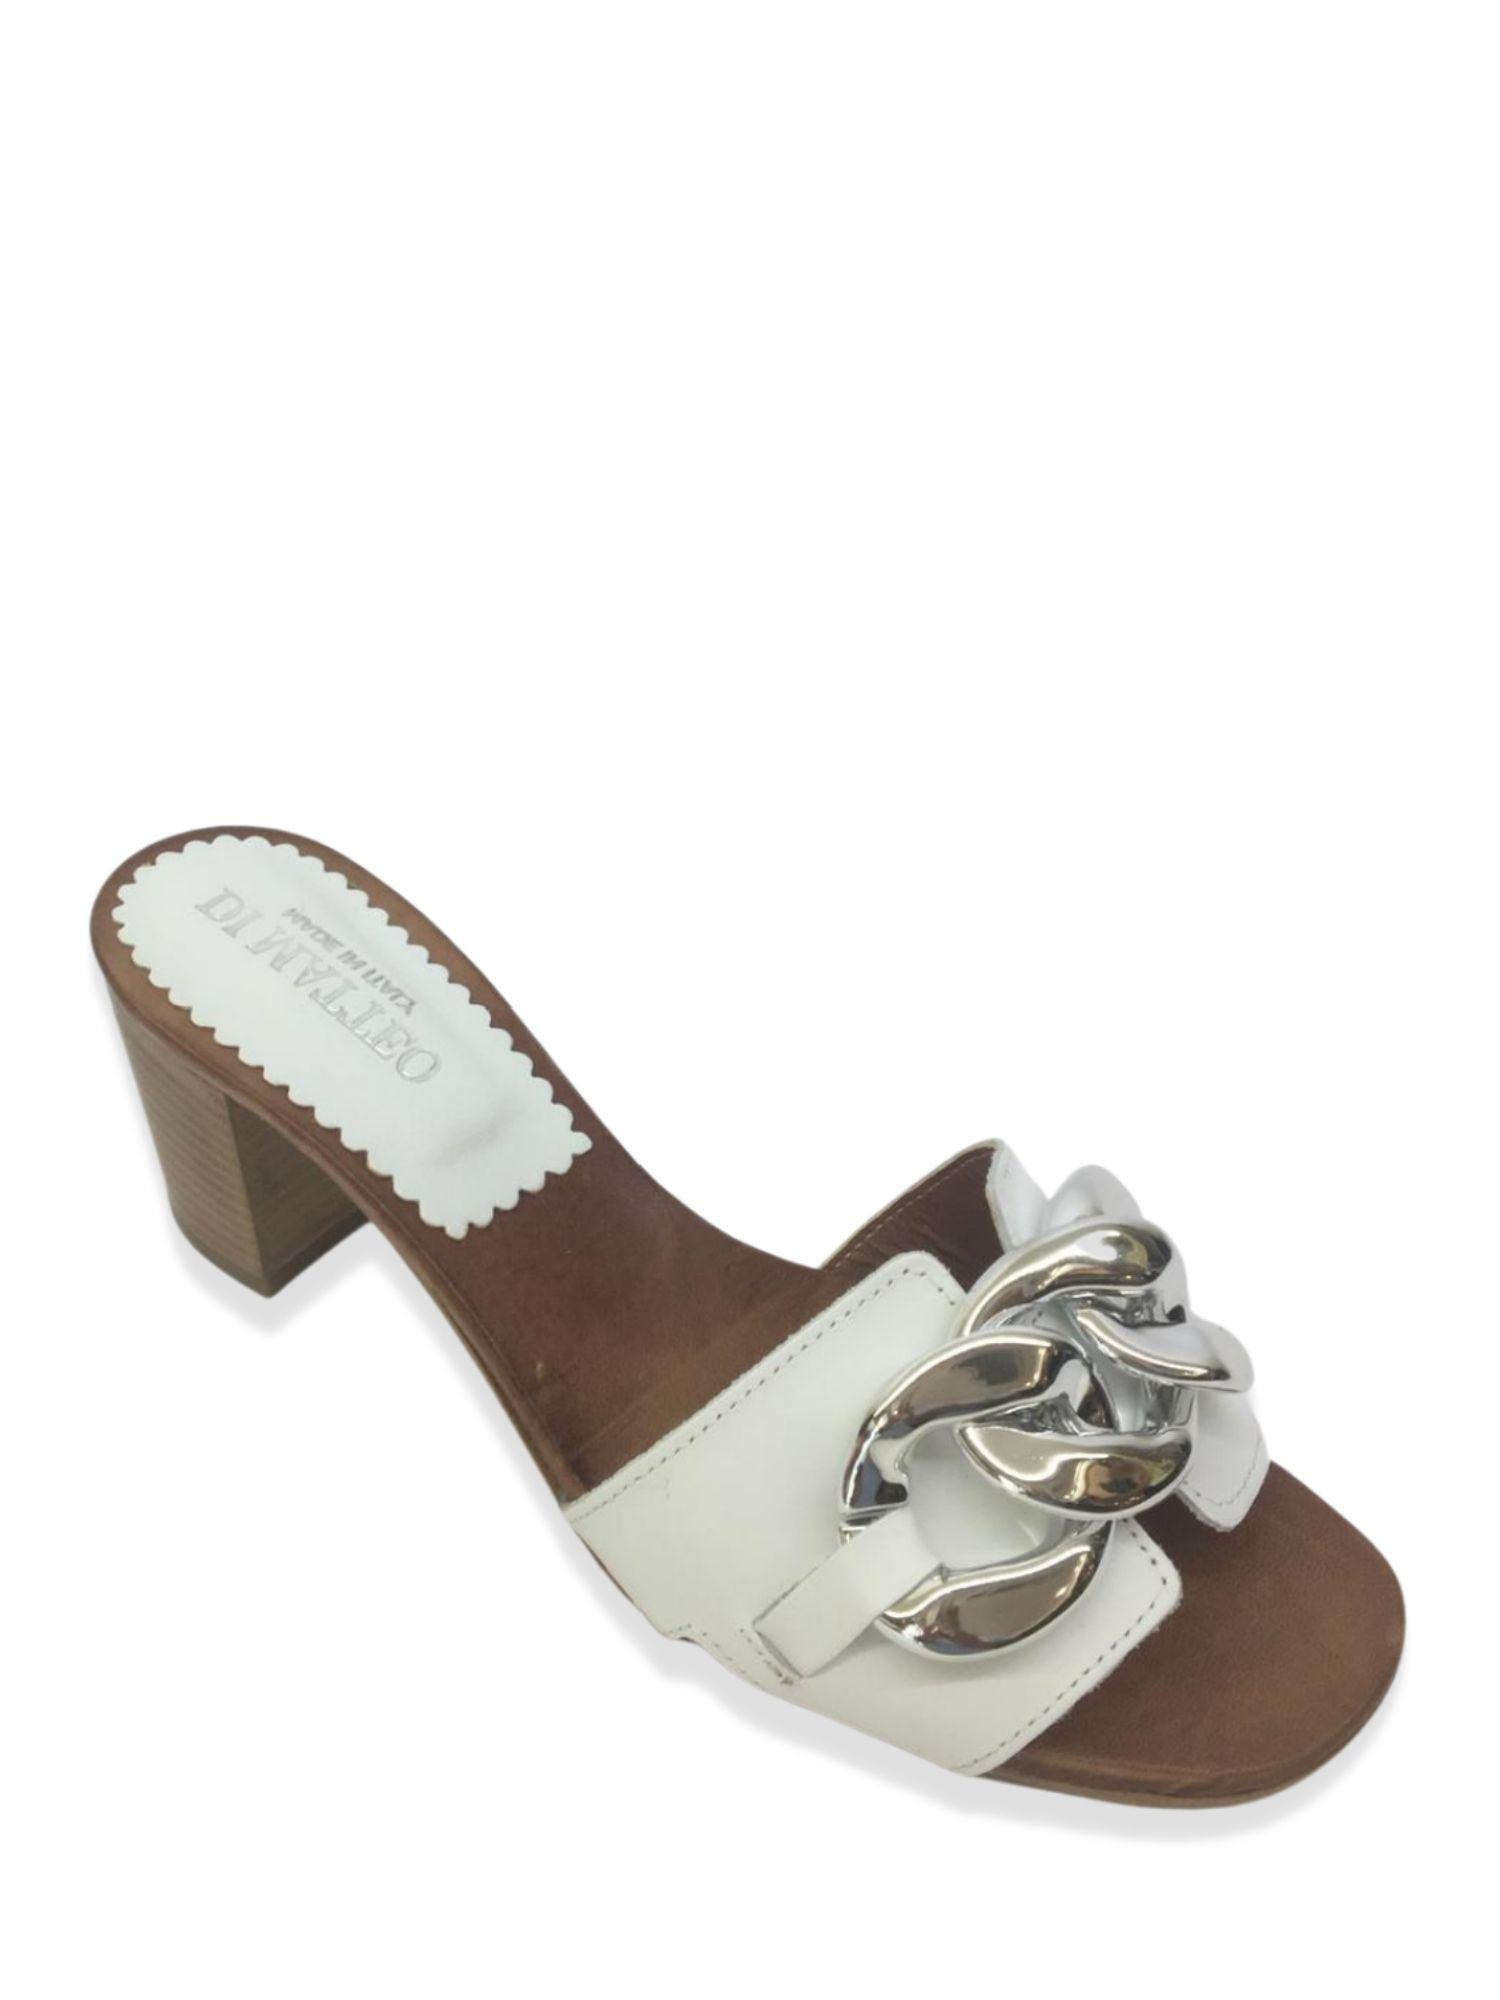 Sandalo Scalzato Made in Italy 500 Bianco alto 2